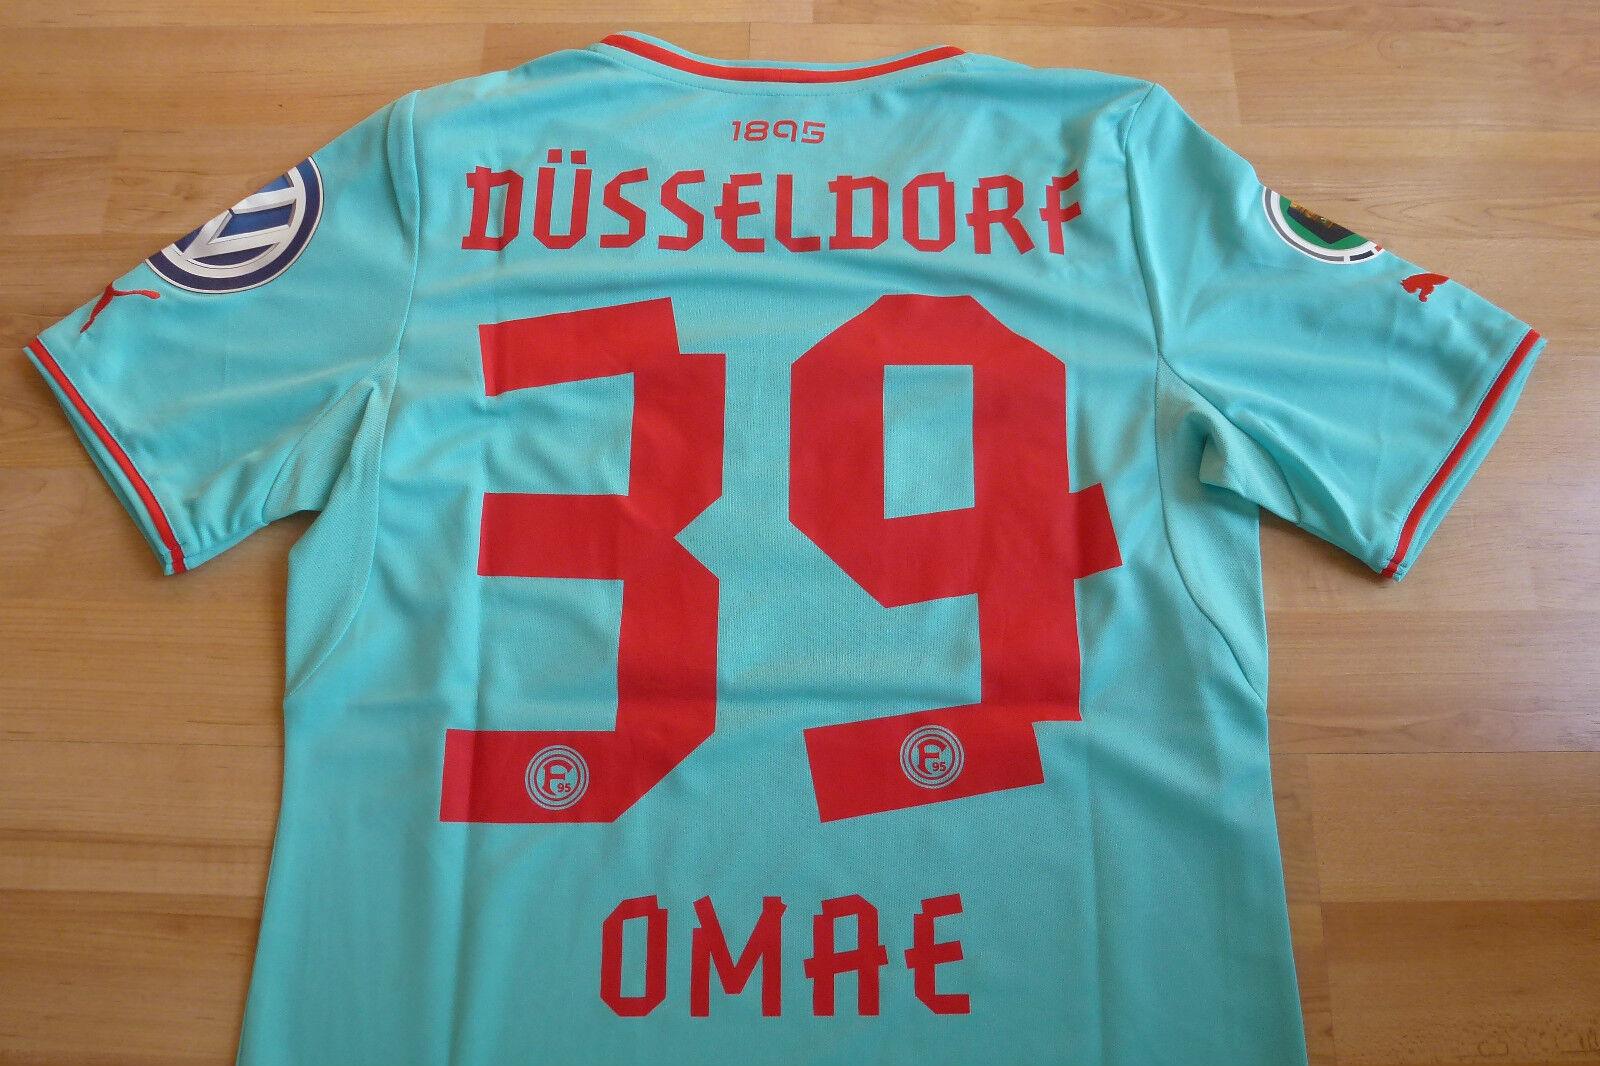 Fortuna Düsseldorf Pokal Trikot hellblau 2013-14   39 Genki Omae Gr.S  DFB Patch